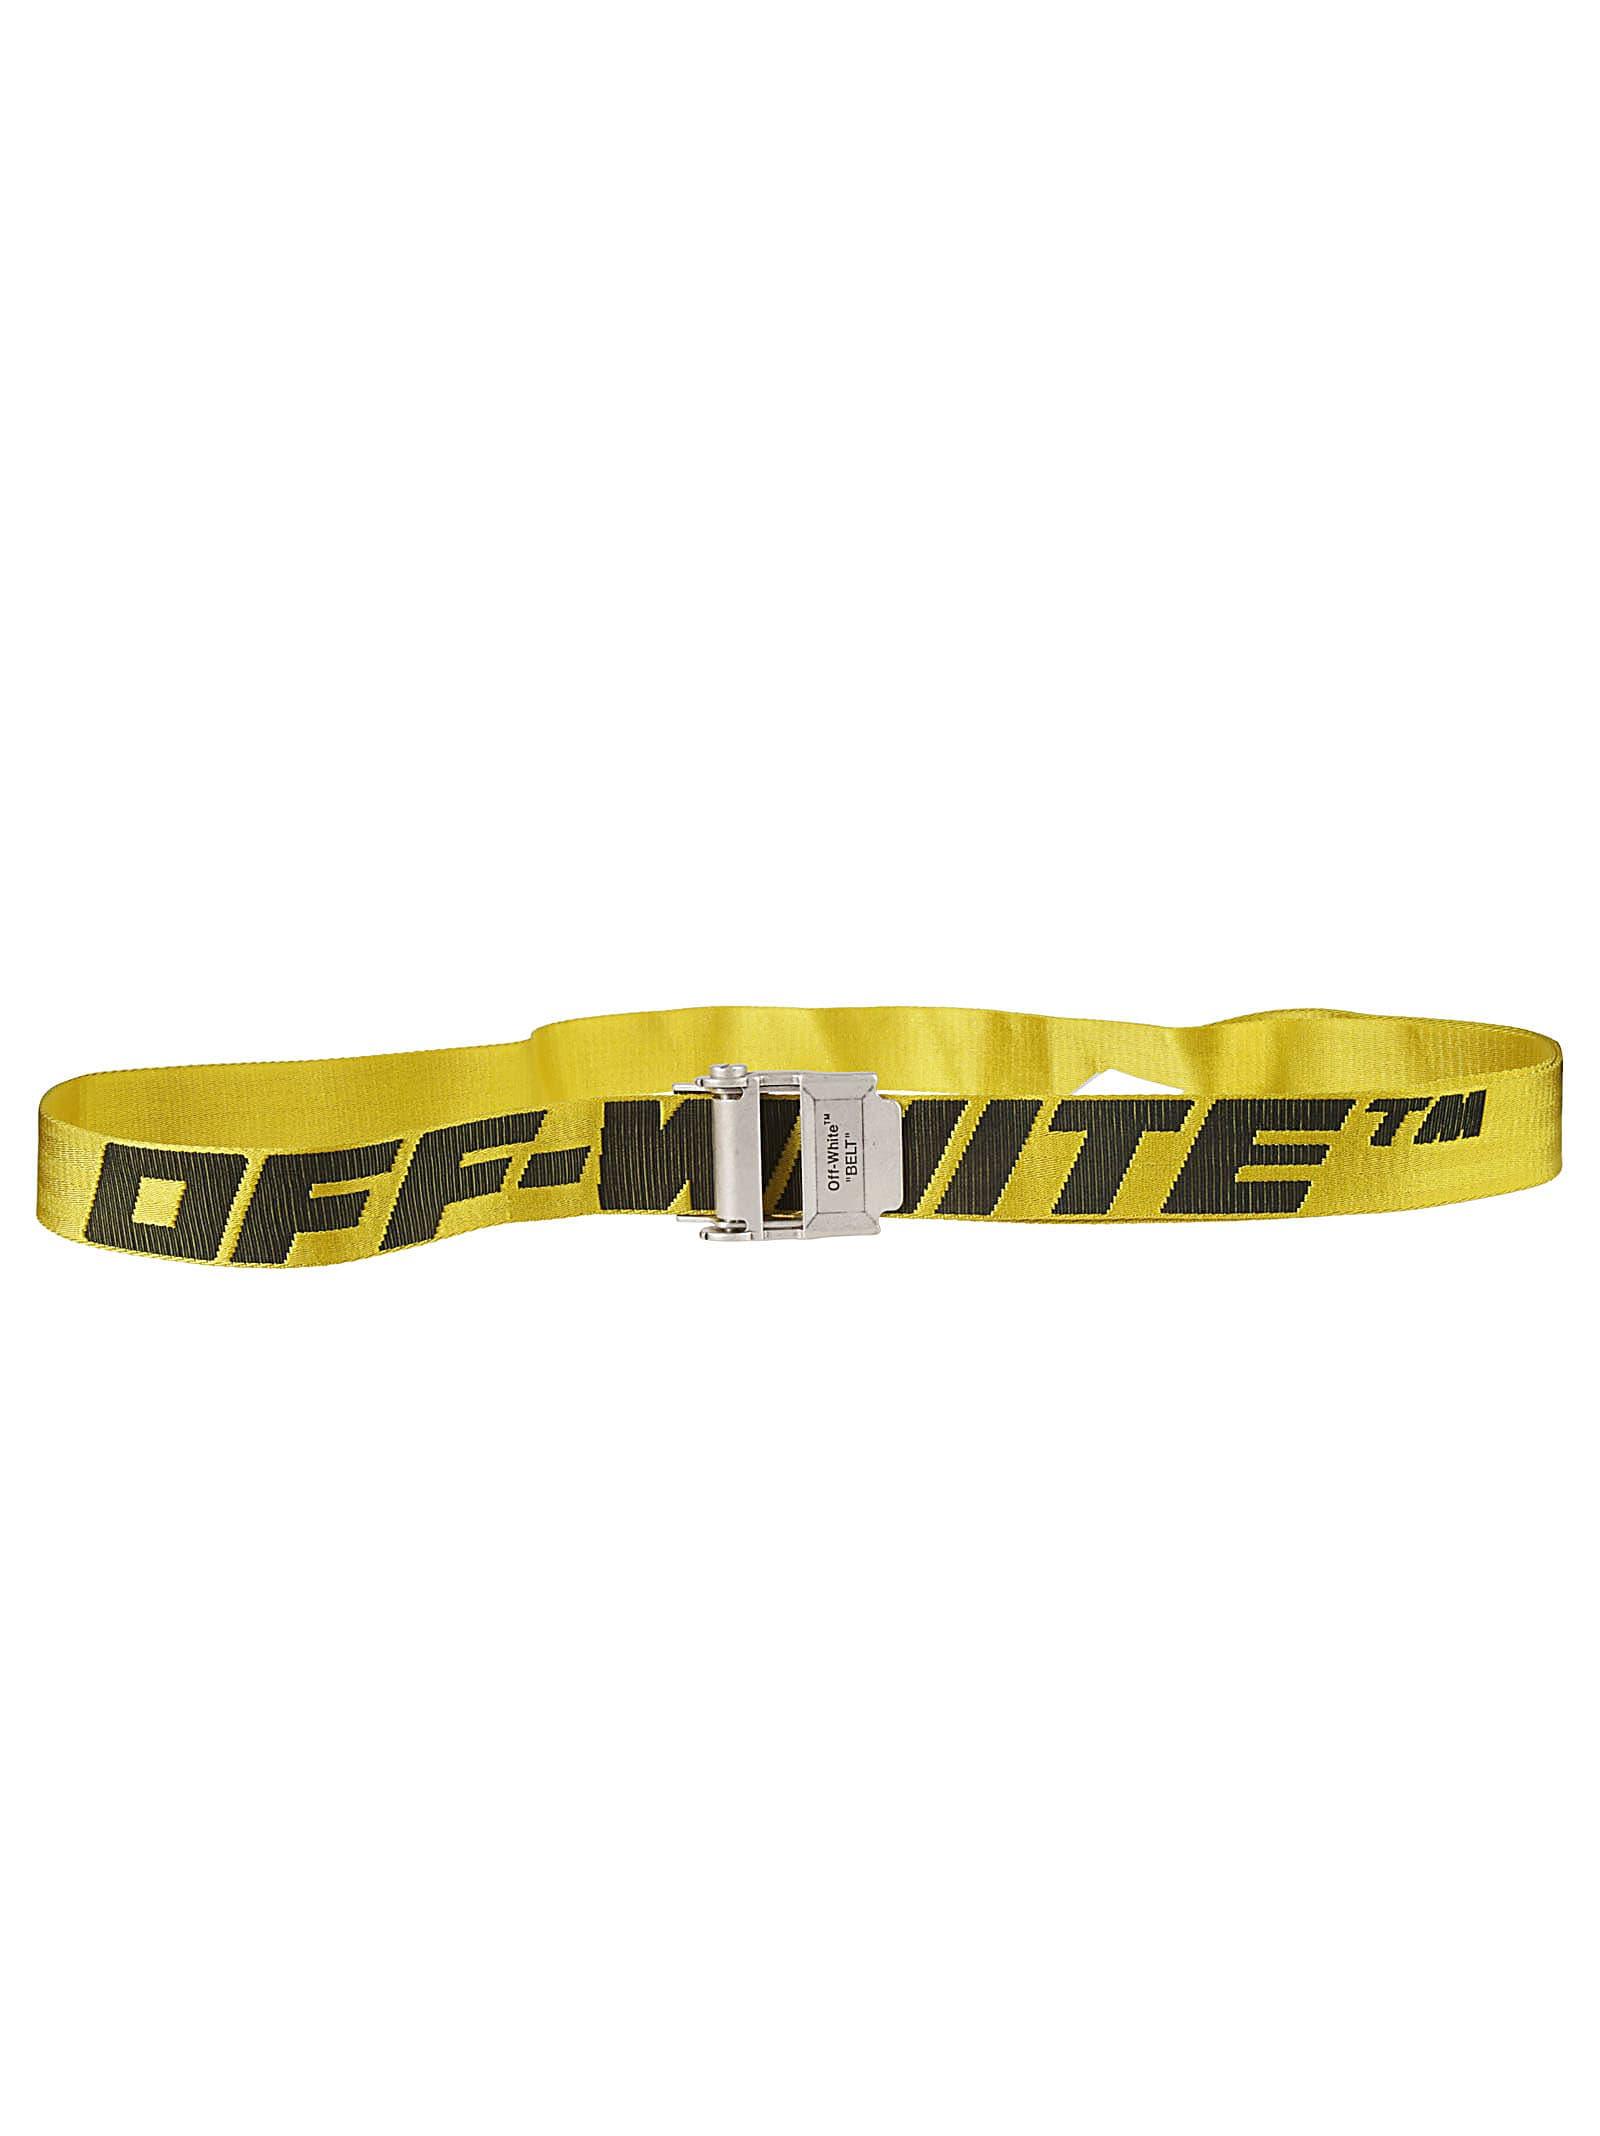 Off-White 2.0 Industrial Belt 40 Belt